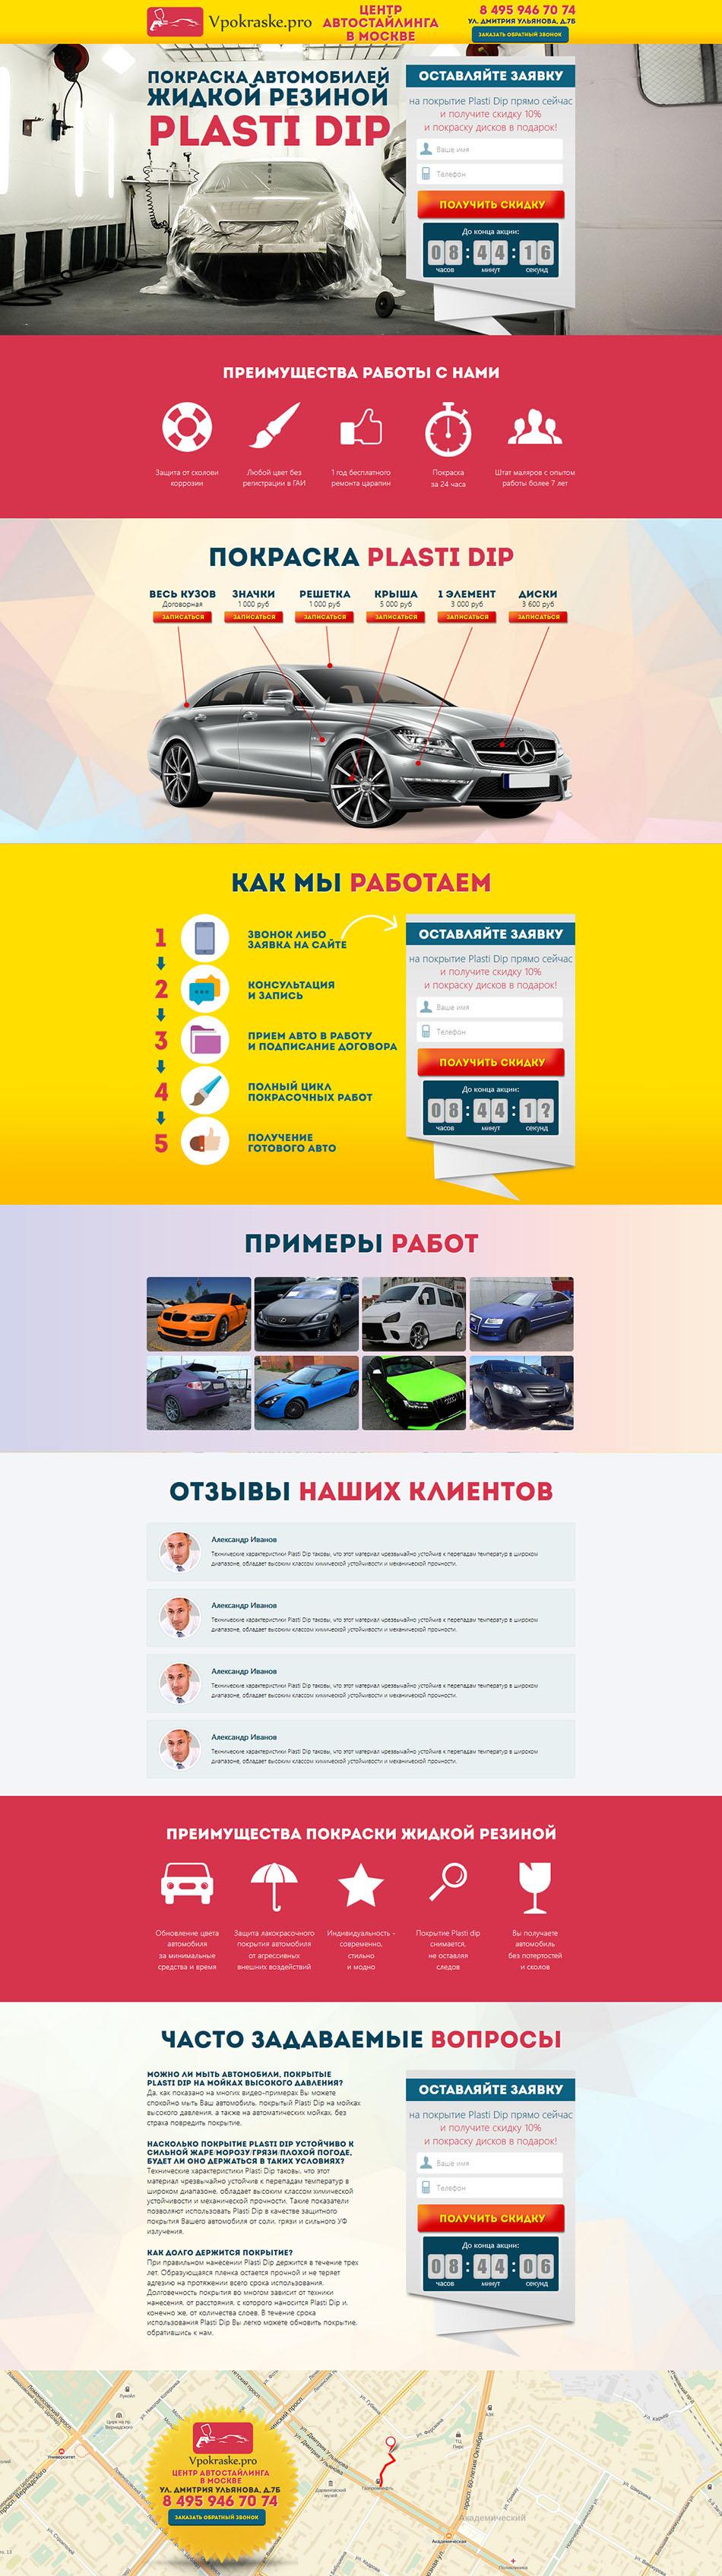 Landing Page Покраска автомобиля